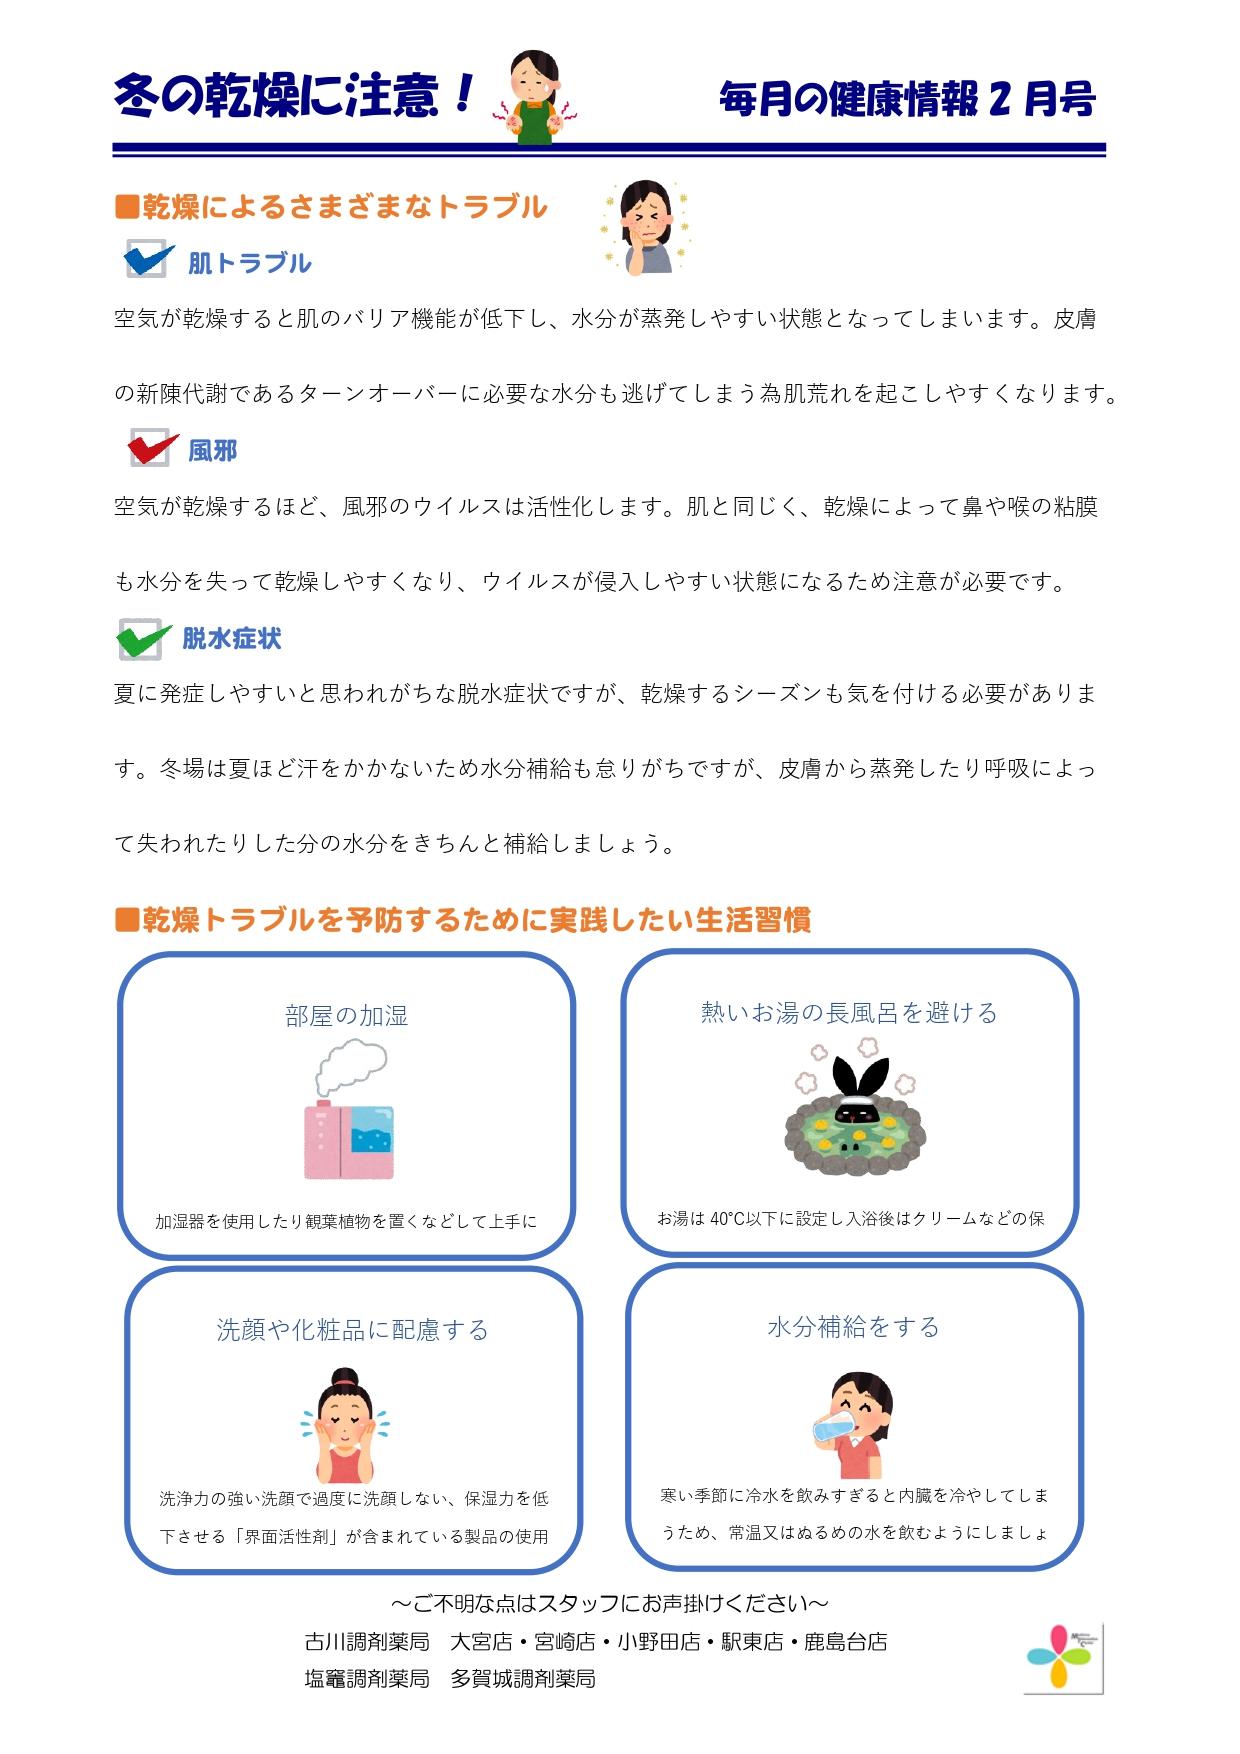 2021.2月 乾燥 健康情報 (003)_page-0001